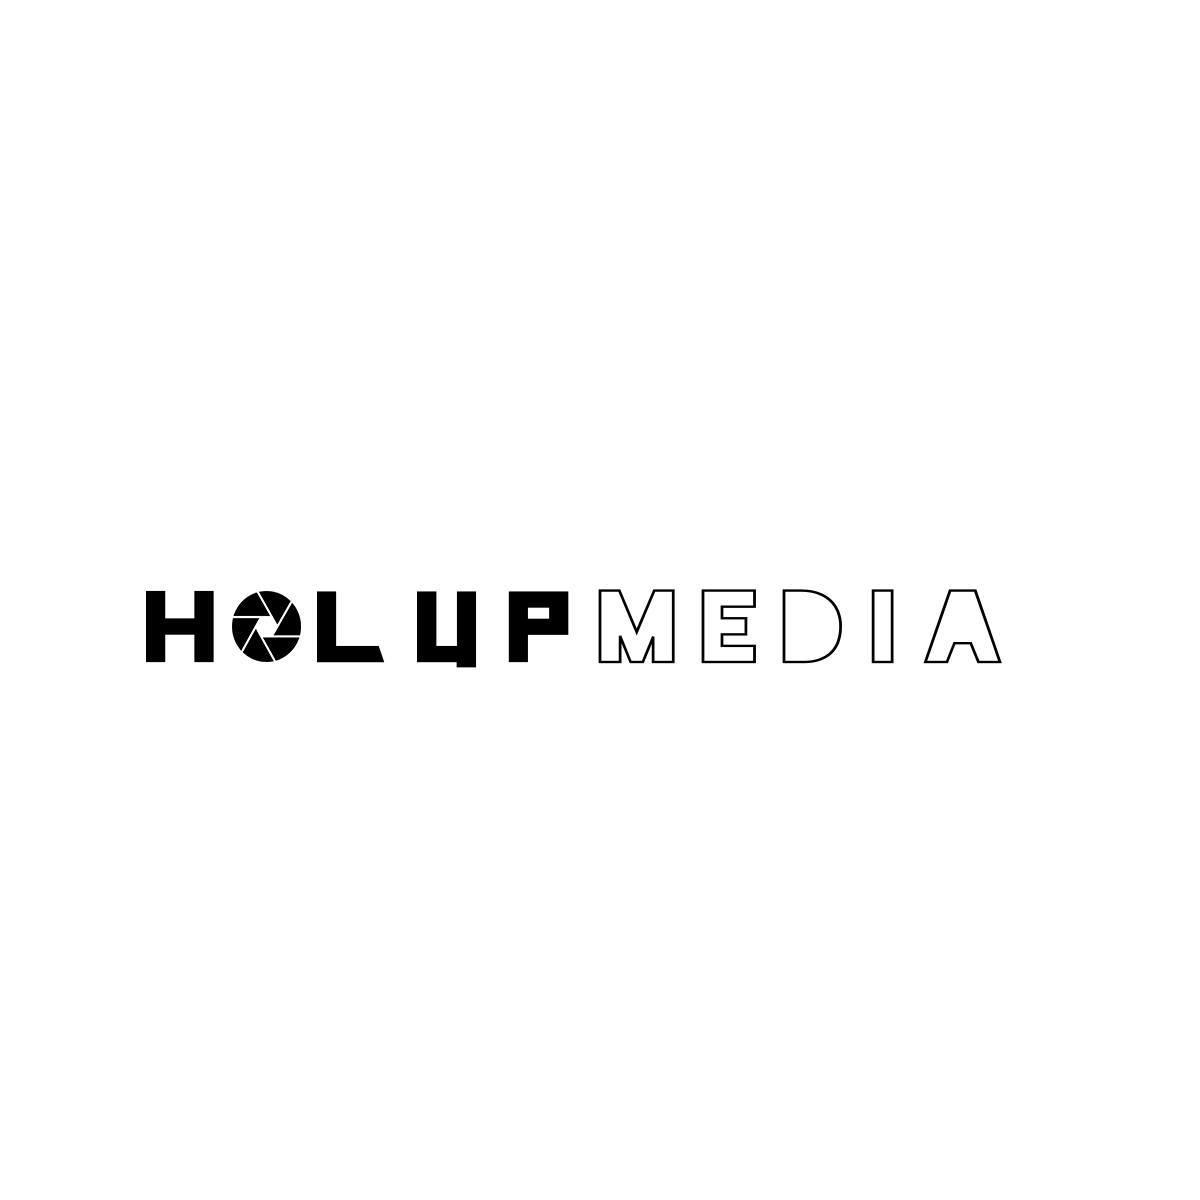 HolUp Media